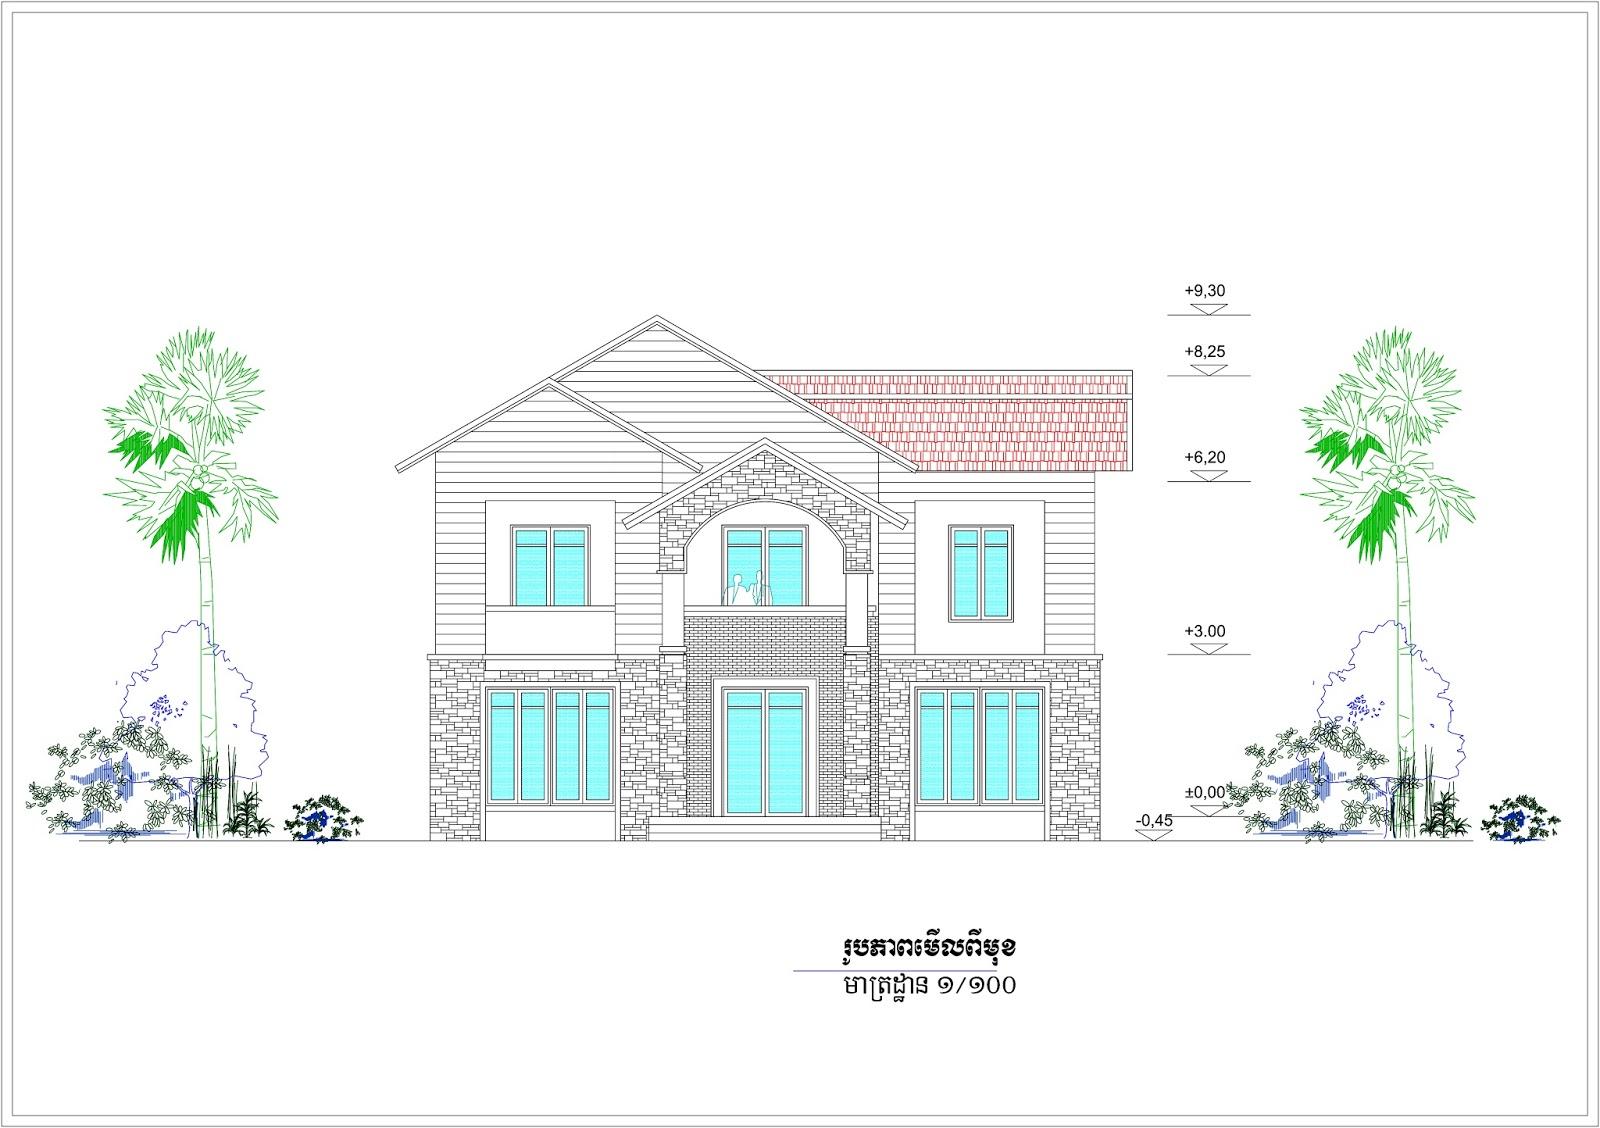 House design 30 x 45 - House Design 30 X 45 Villa Design Idea 12m X 16 5m Sketchup And Lumion